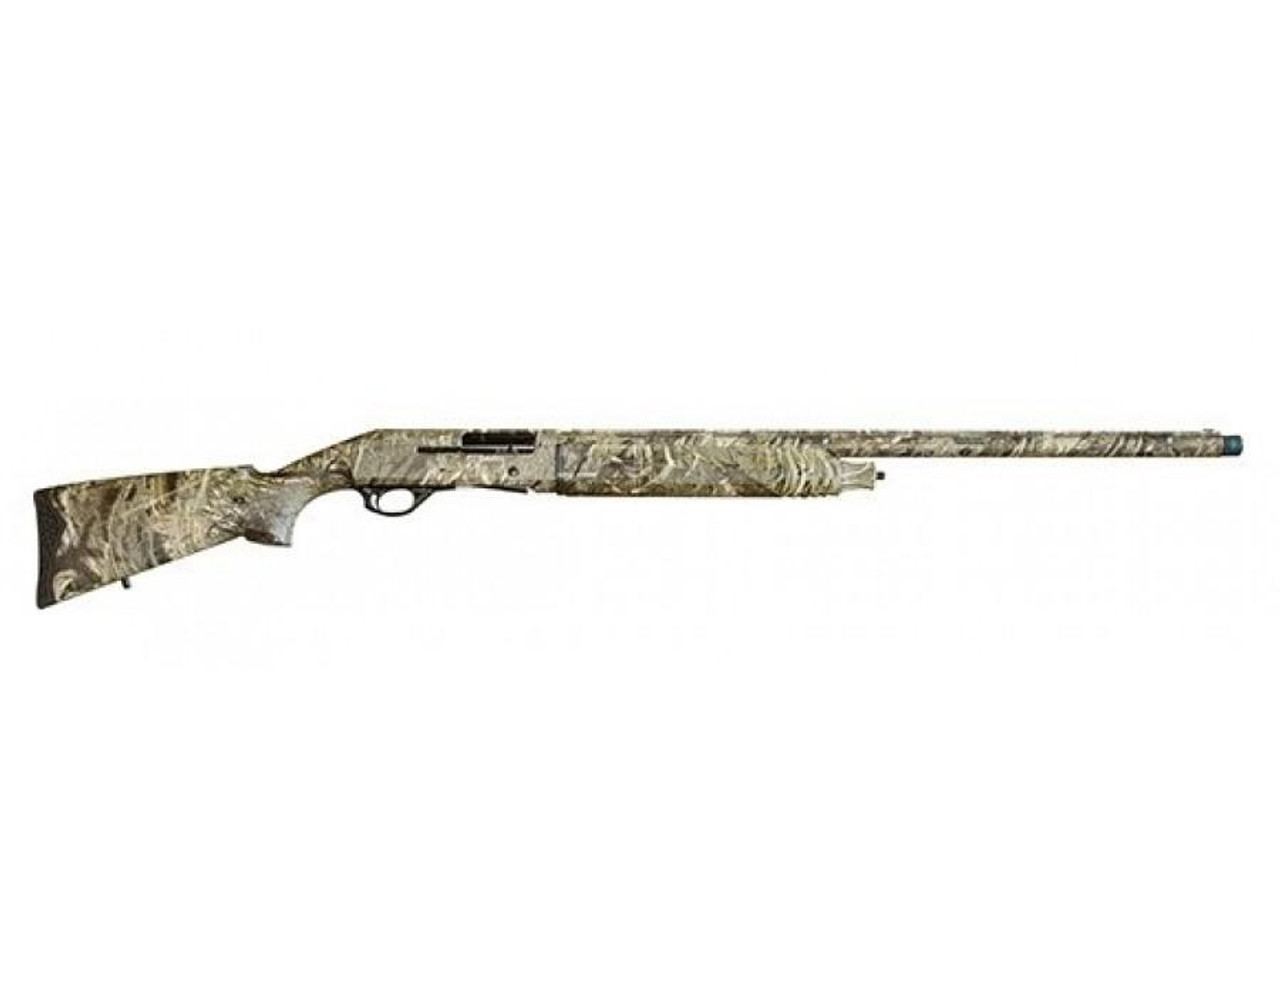 "Canuck Hunter Semi-Auto Shotgun, 20 Gauge, 3"", 28"" Brl, Mossy Oak Duck Blind Camo 4+1 plug to 2+1 Shots, 5 Chokes, Hard Case, Canuck Markings"